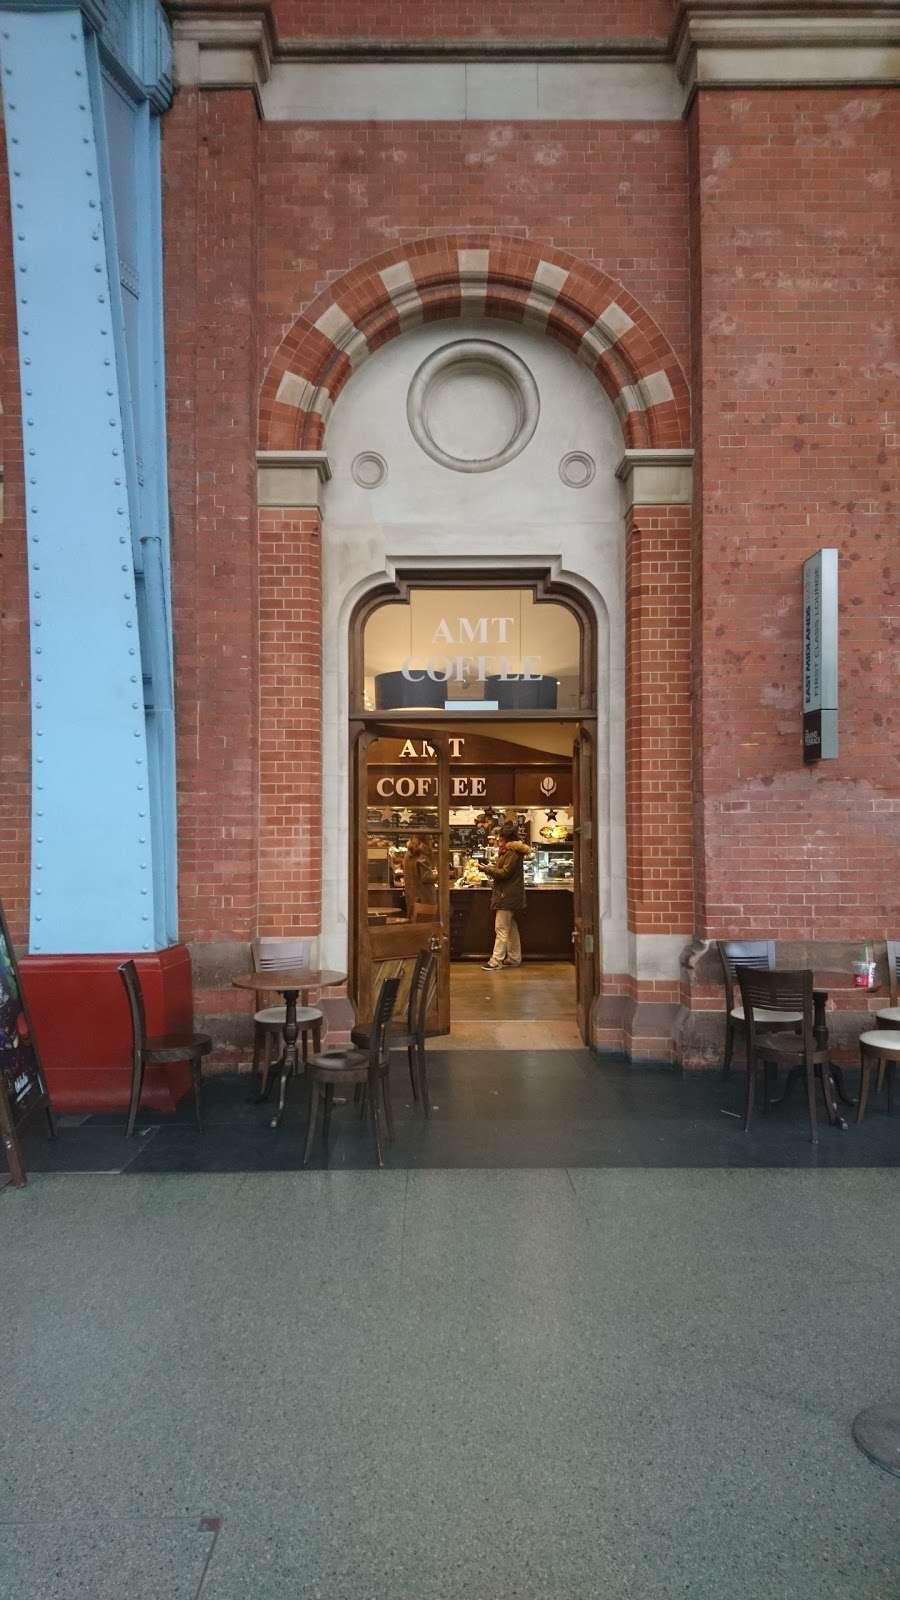 AMT Coffee - cafe  | Photo 8 of 10 | Address: Euston Rd, Kings Cross, London N1C 4QP, UK | Phone: 020 3772 4000